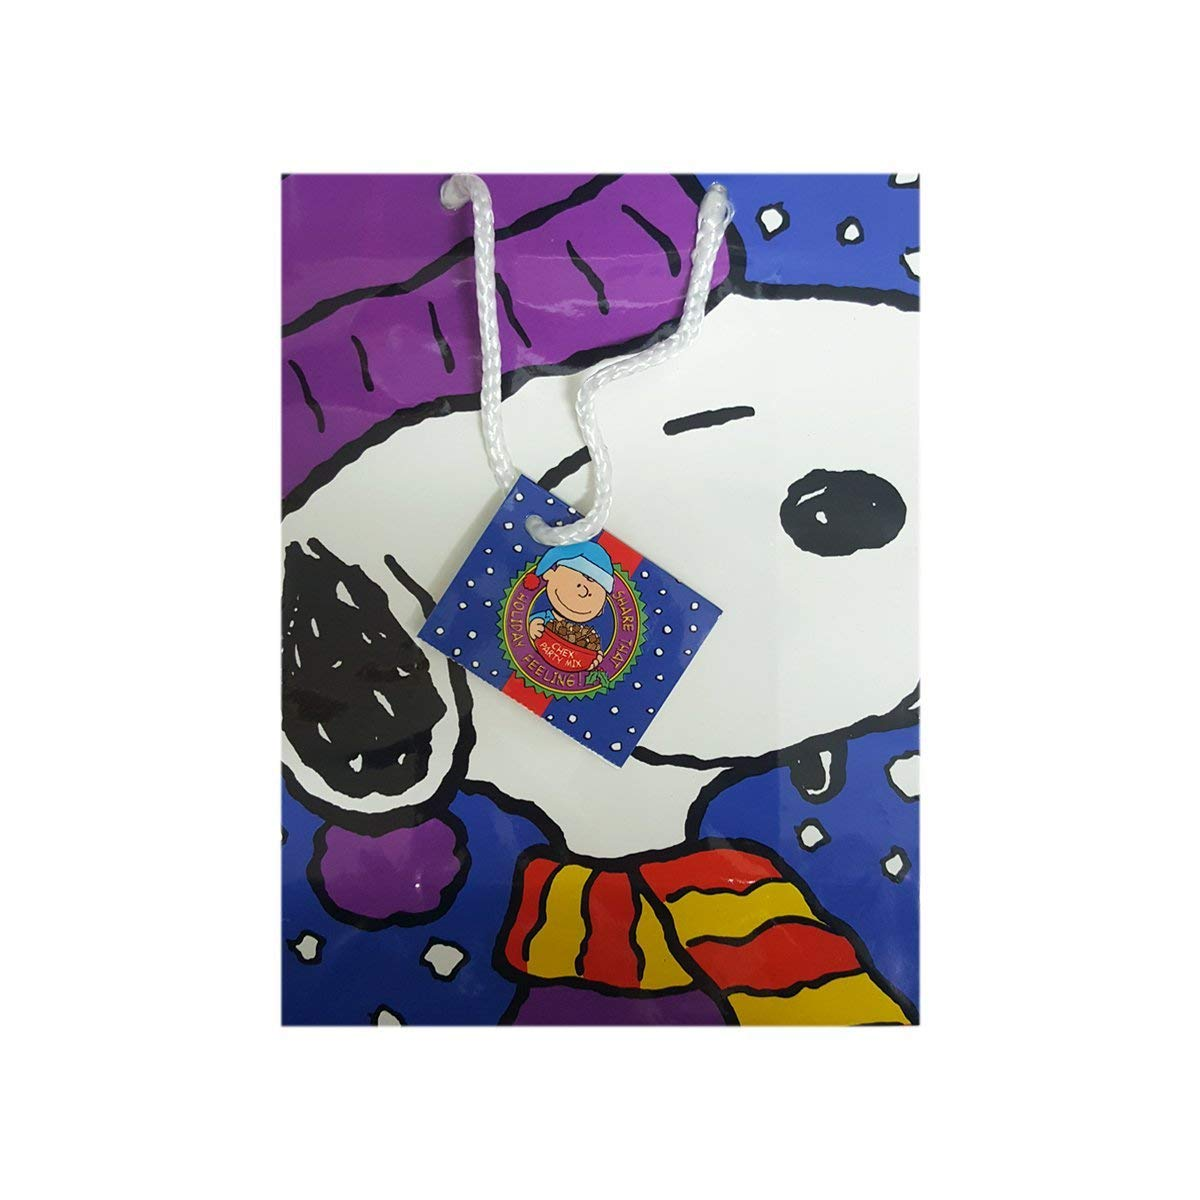 "Chex Ralston Peanuts Snoopy Christmas Gift Bag 7"" x 3"" x 9"""